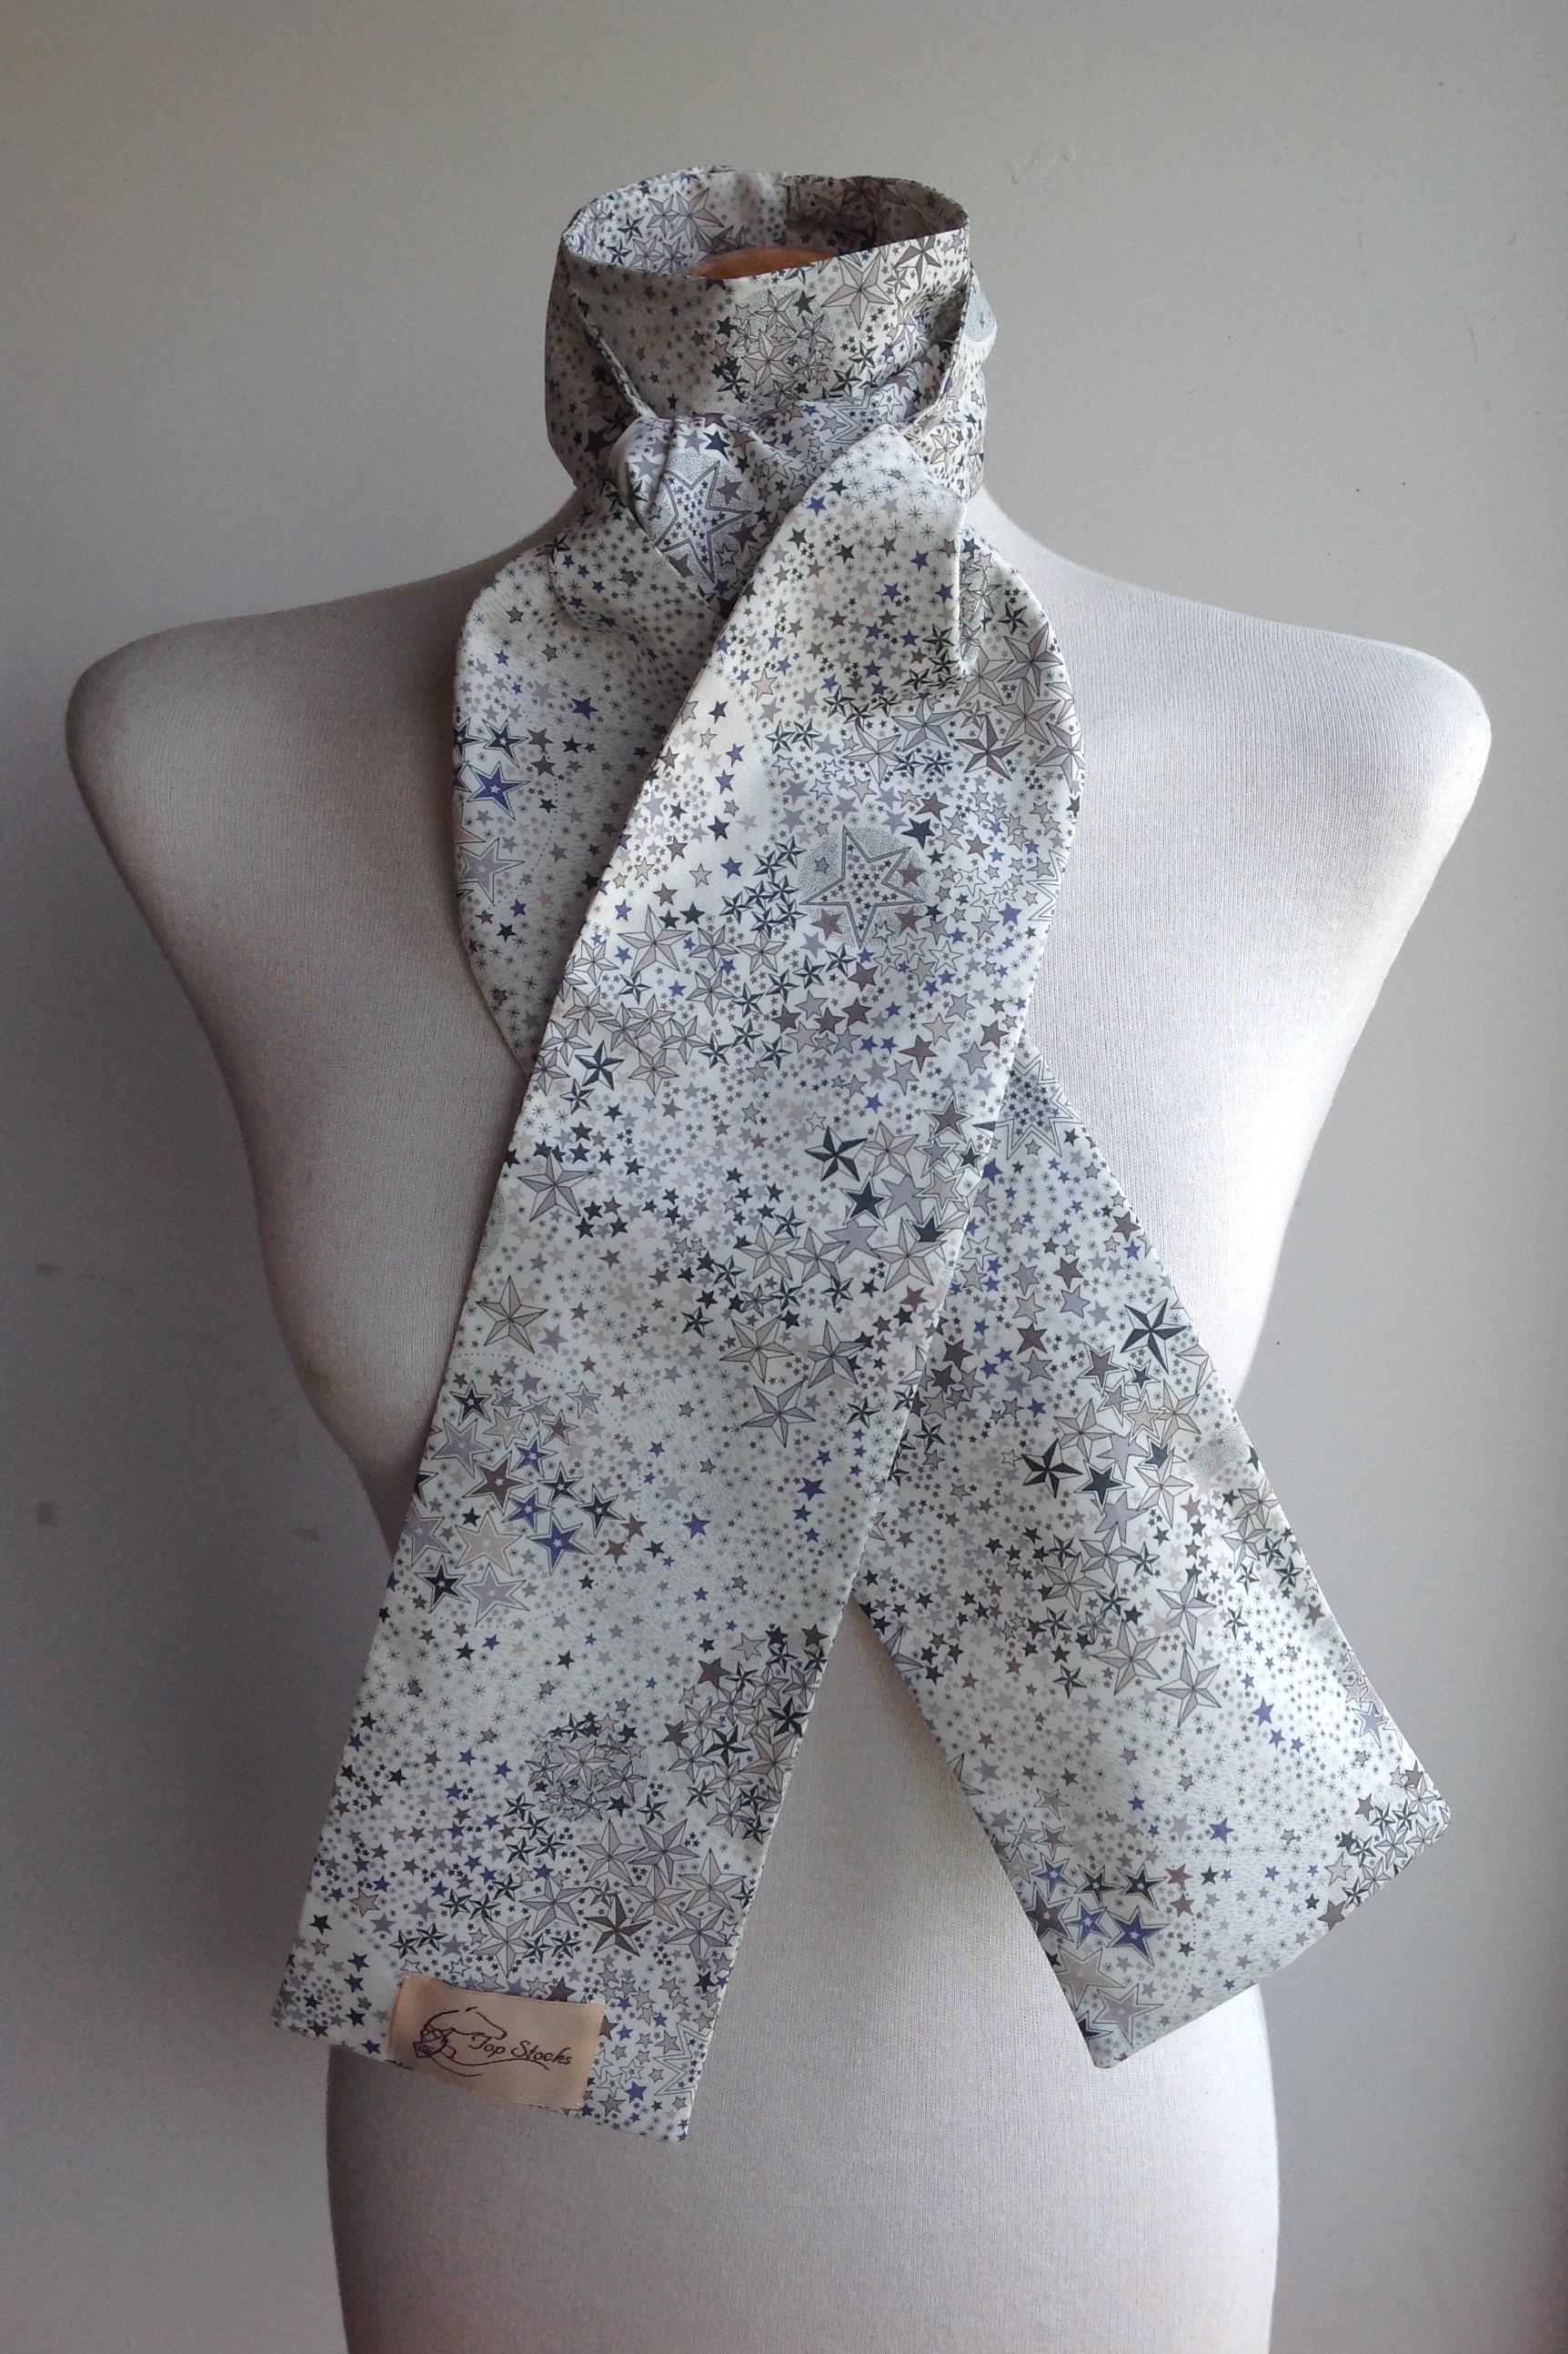 Shaped to tie Liberty tana lawn stock - Adelajda greys colourway